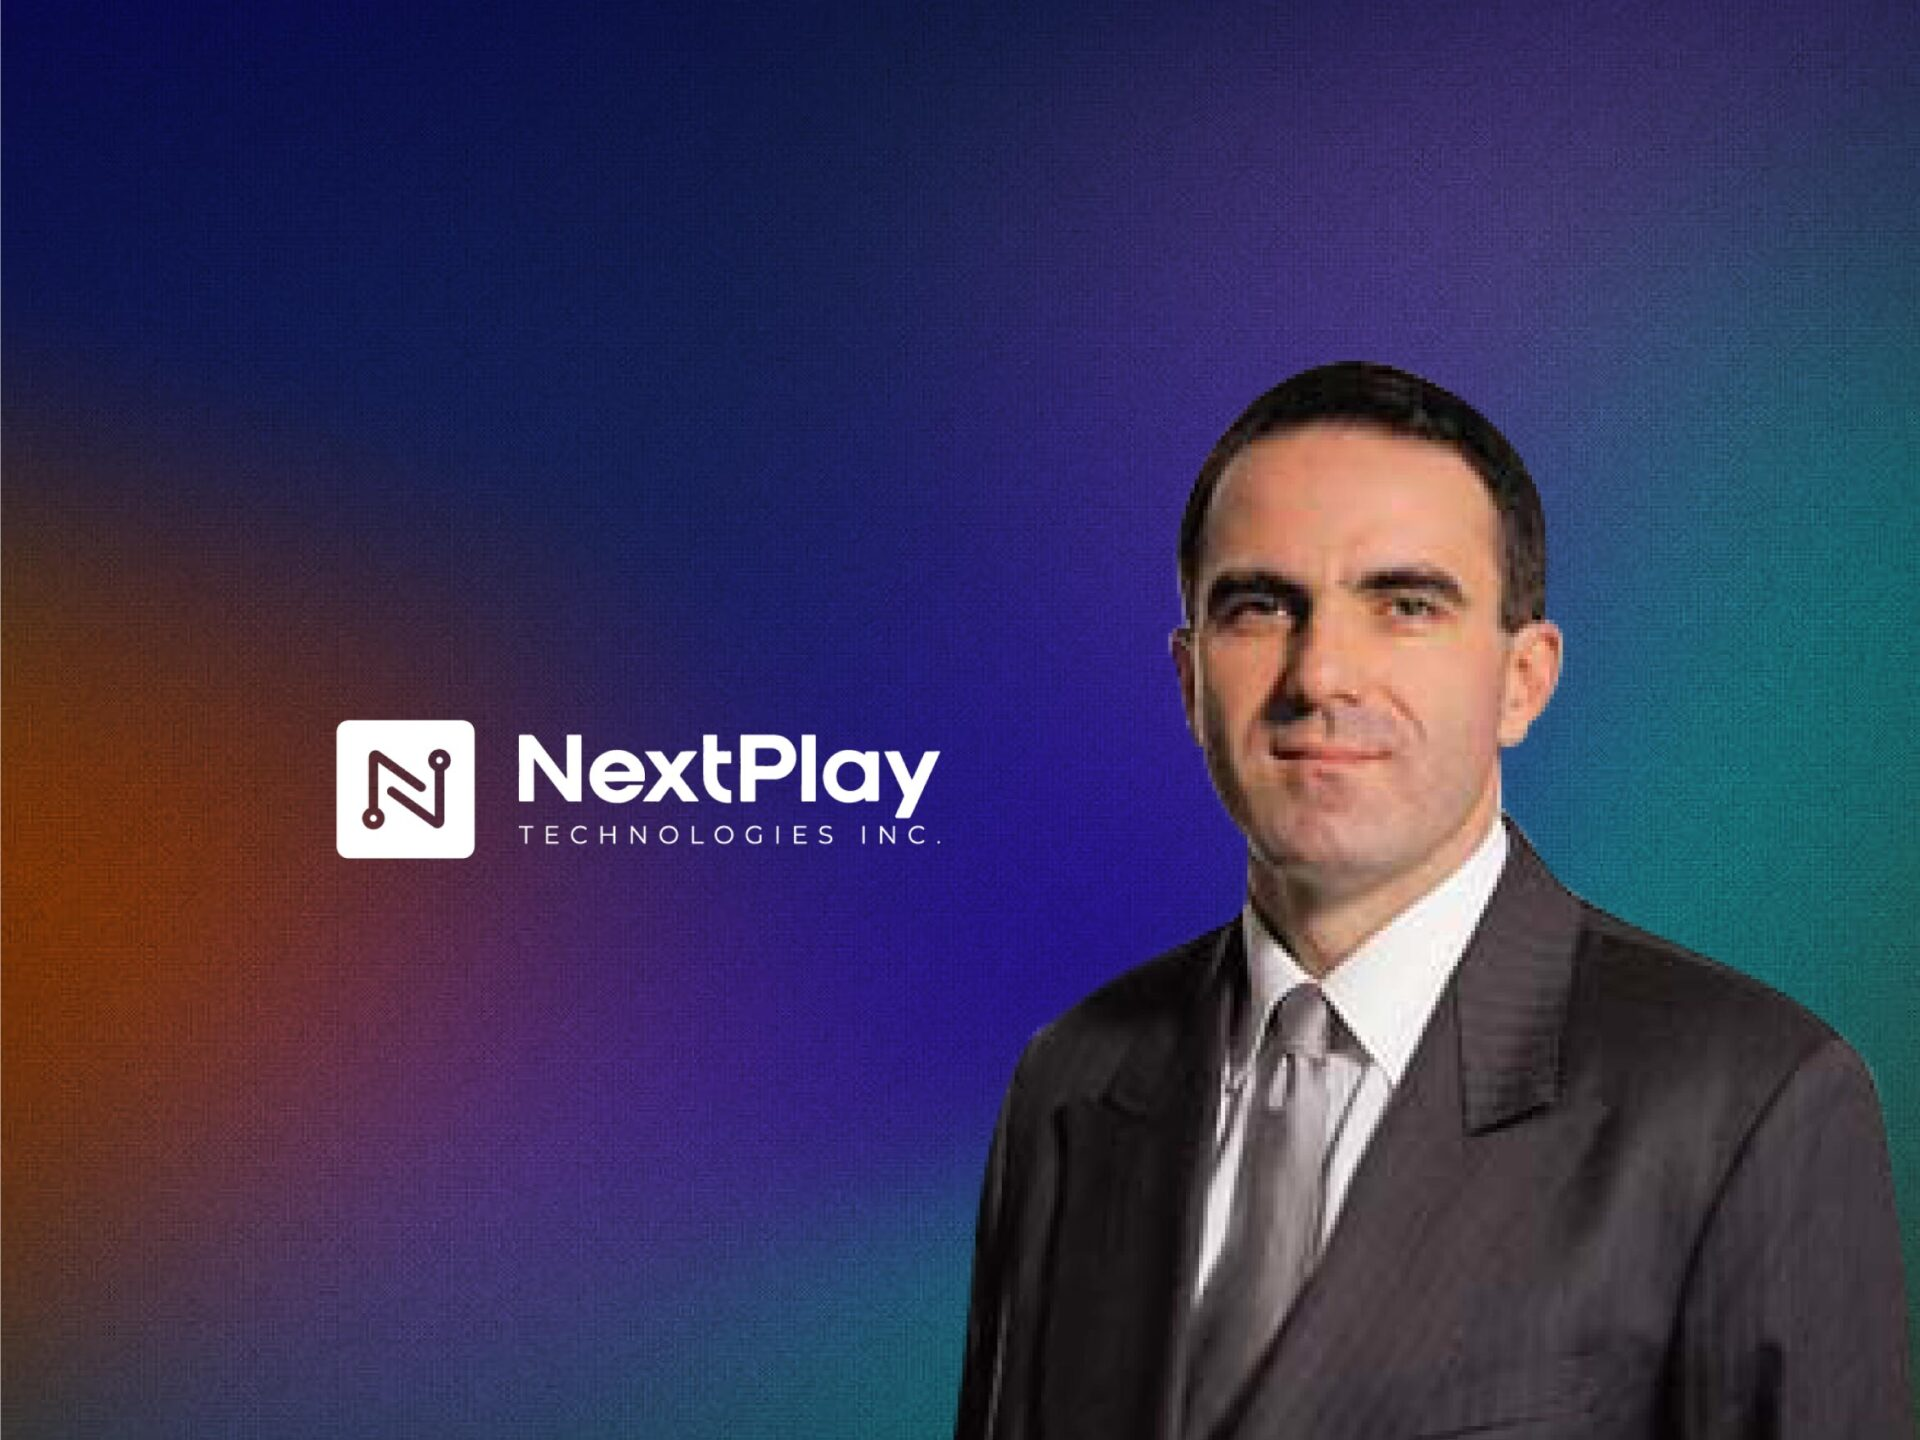 Global Fintech Interview with Todd Bonner, Co-Chairman at NextPlay Technologies